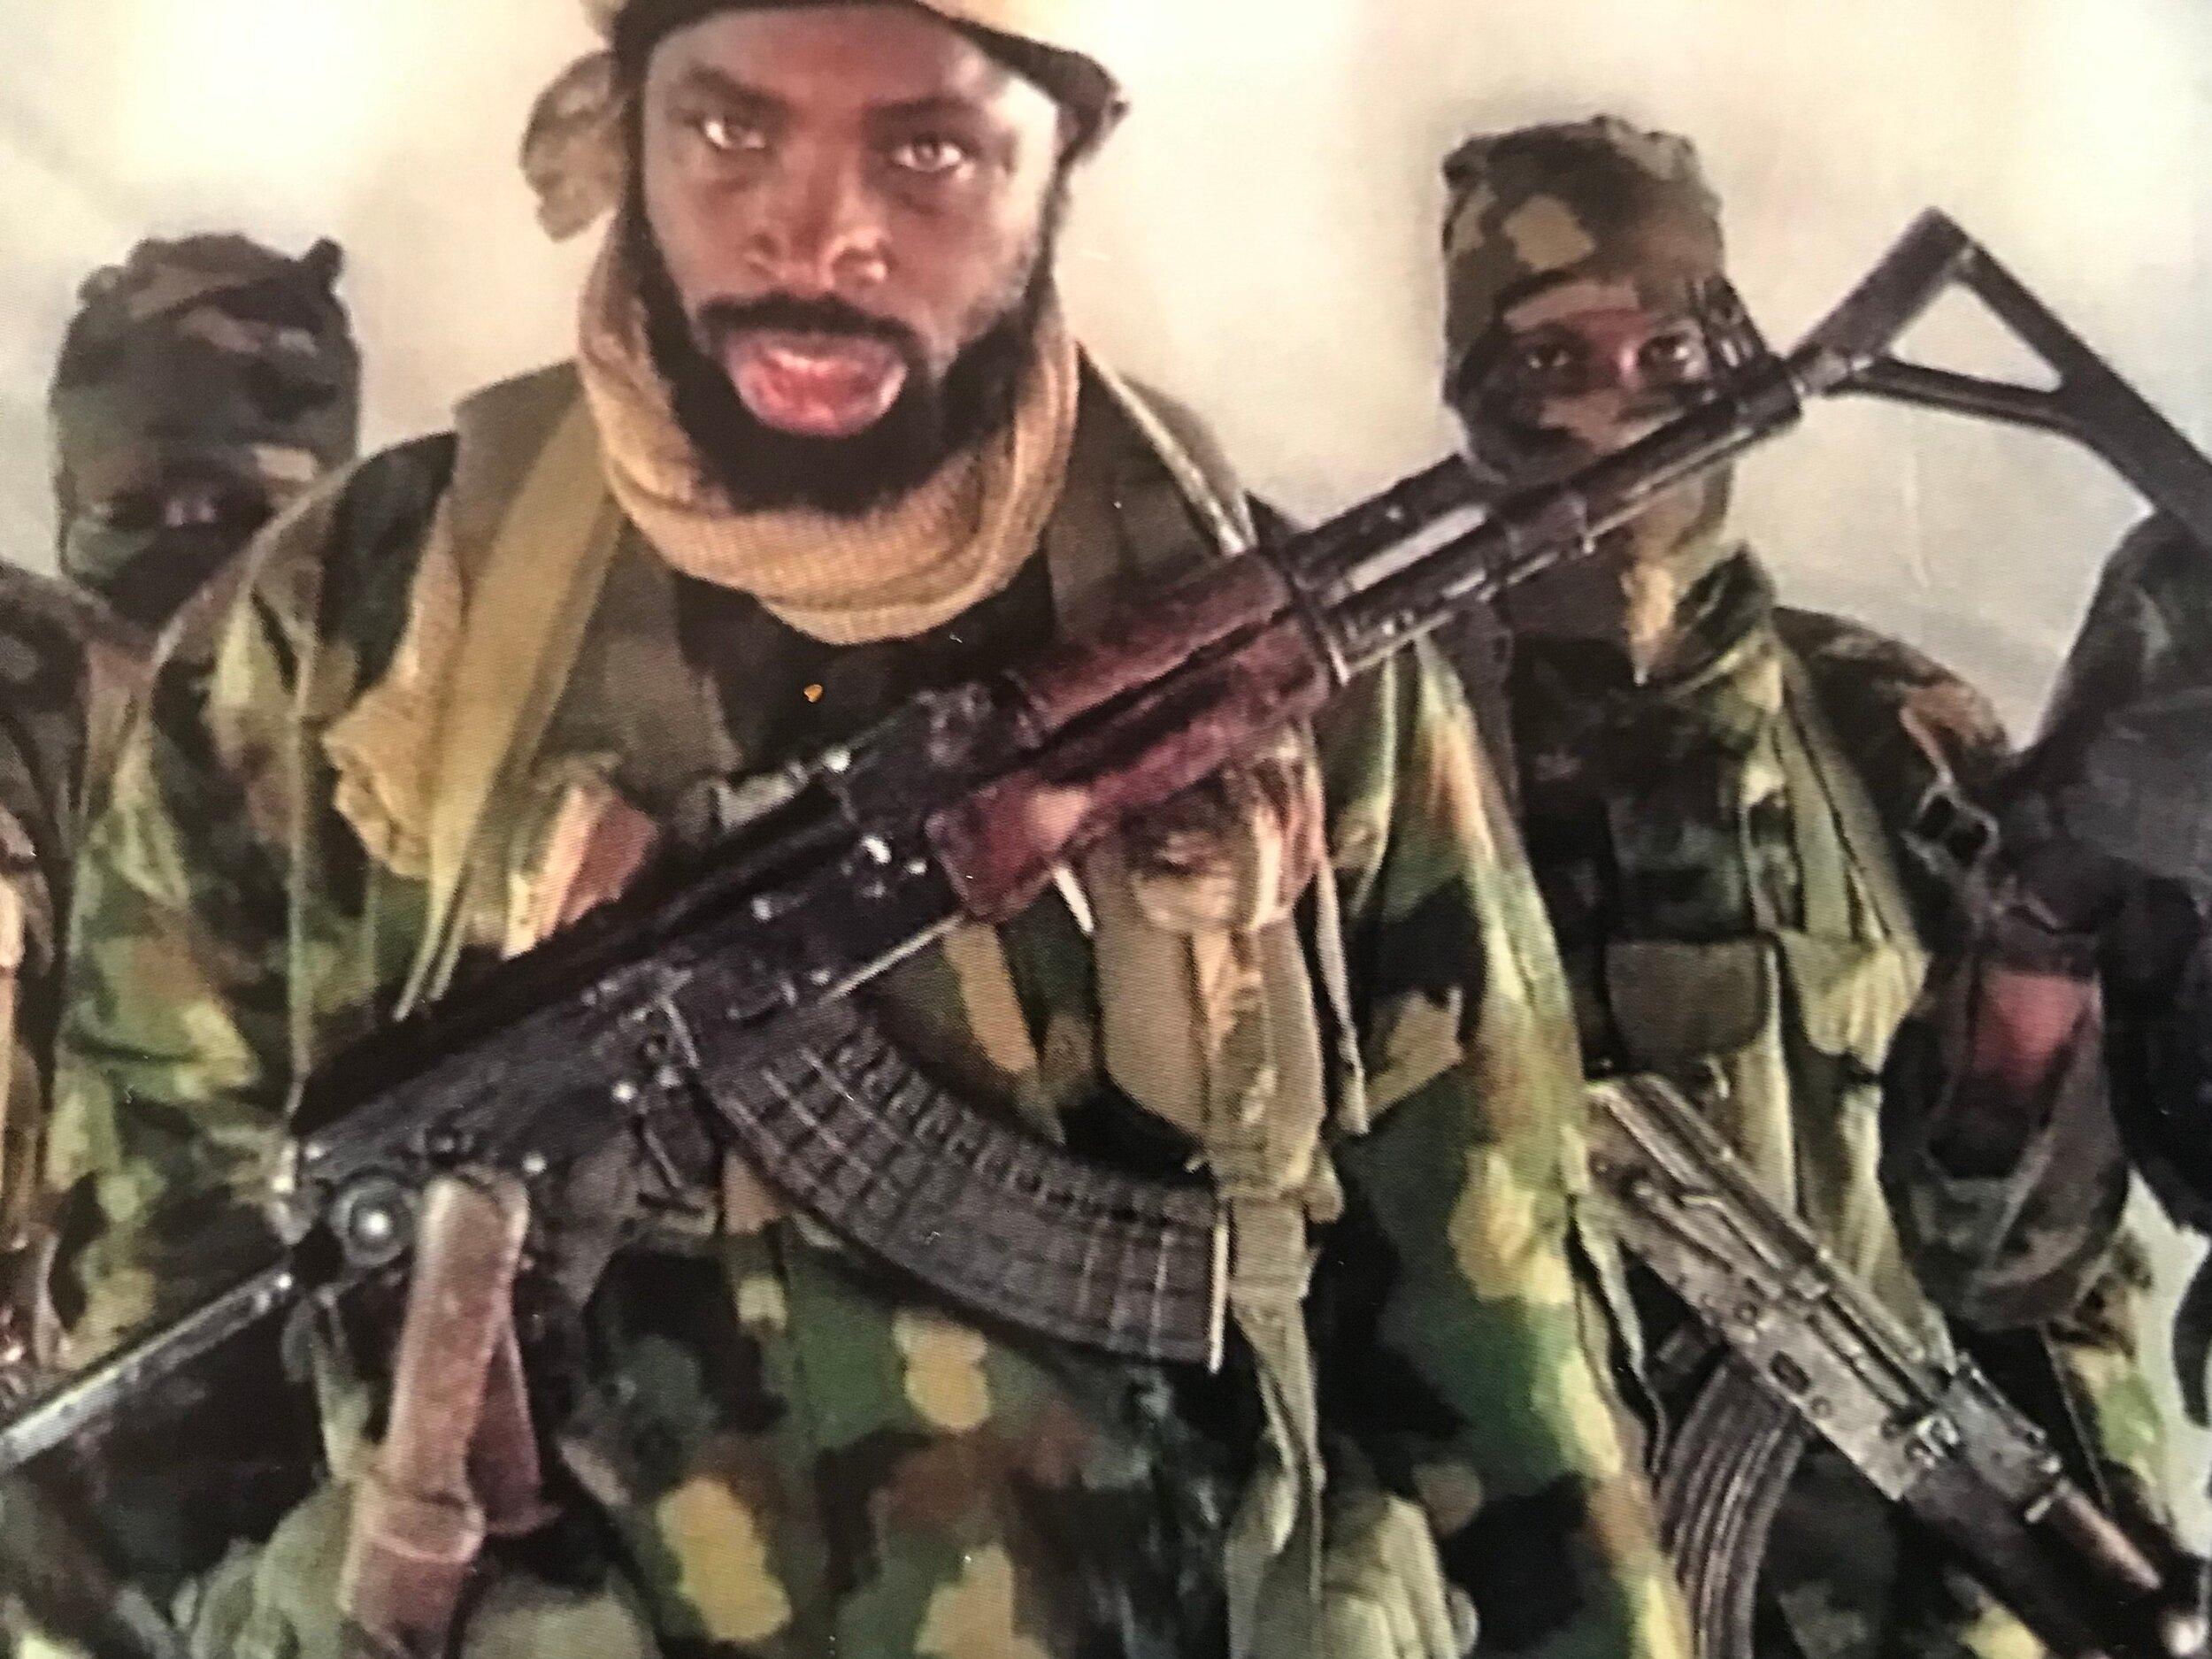 Boko Haram's henchmen . . .the faces of evil in Nigeria.